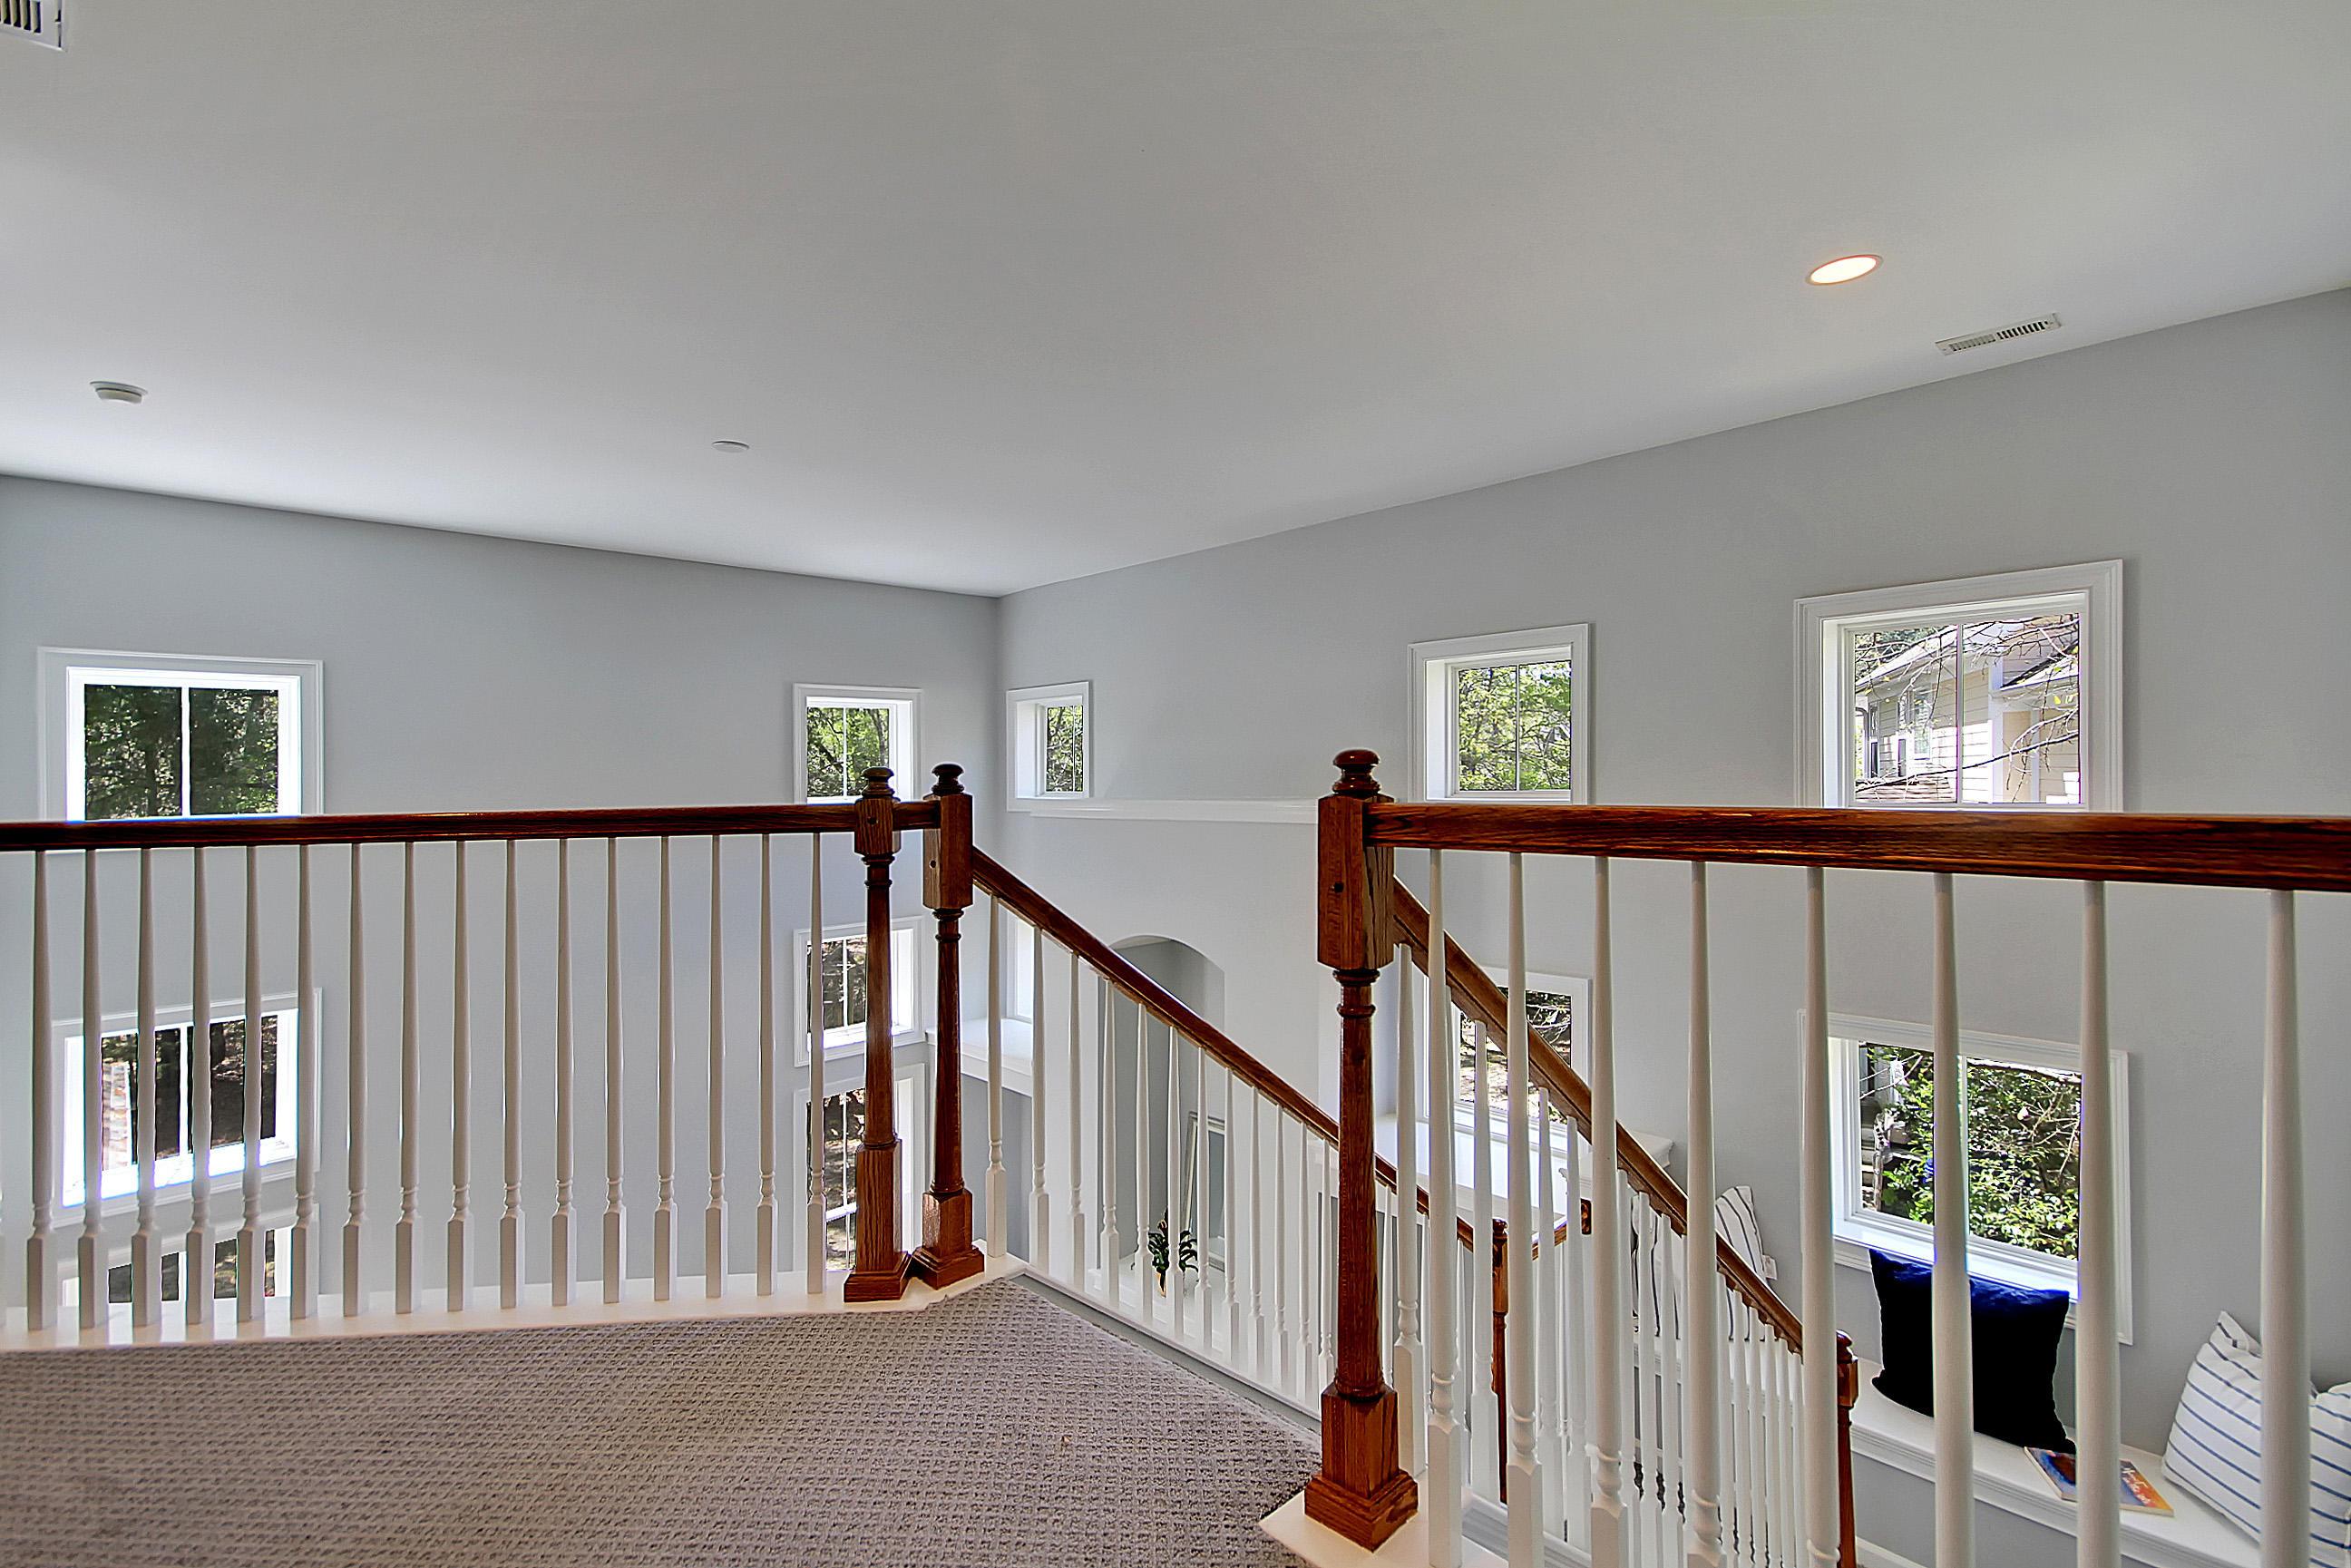 Park West Homes For Sale - 1883 Hall Point, Mount Pleasant, SC - 1